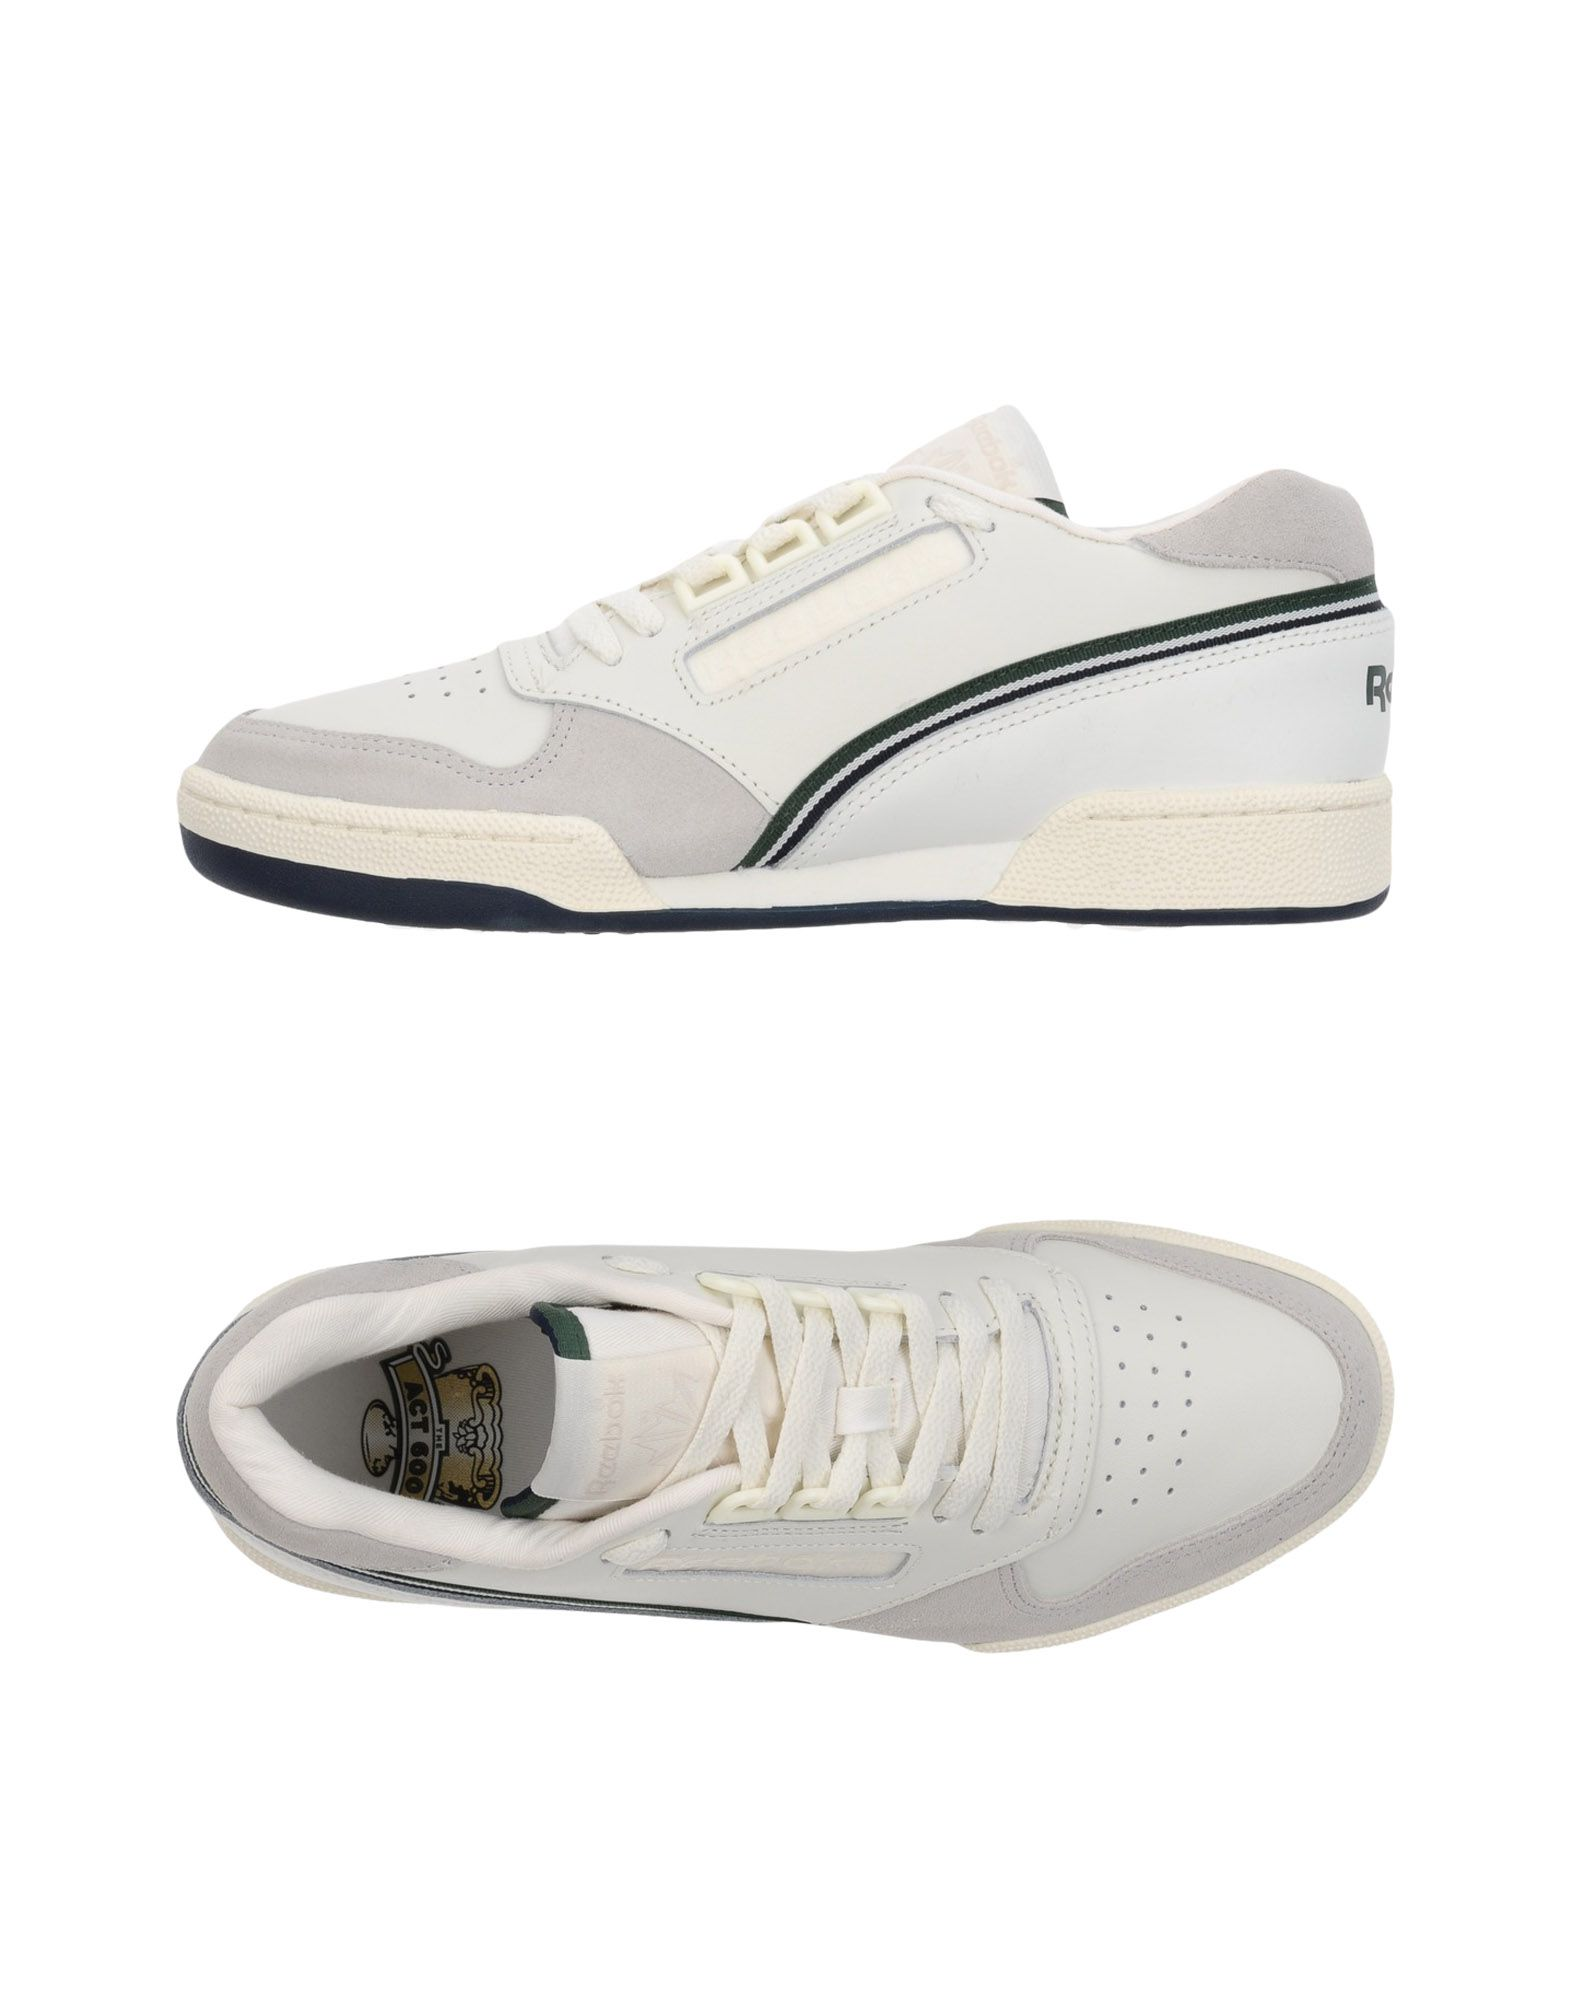 11360667JG Reebok Sneakers Herren  11360667JG  5a41a3